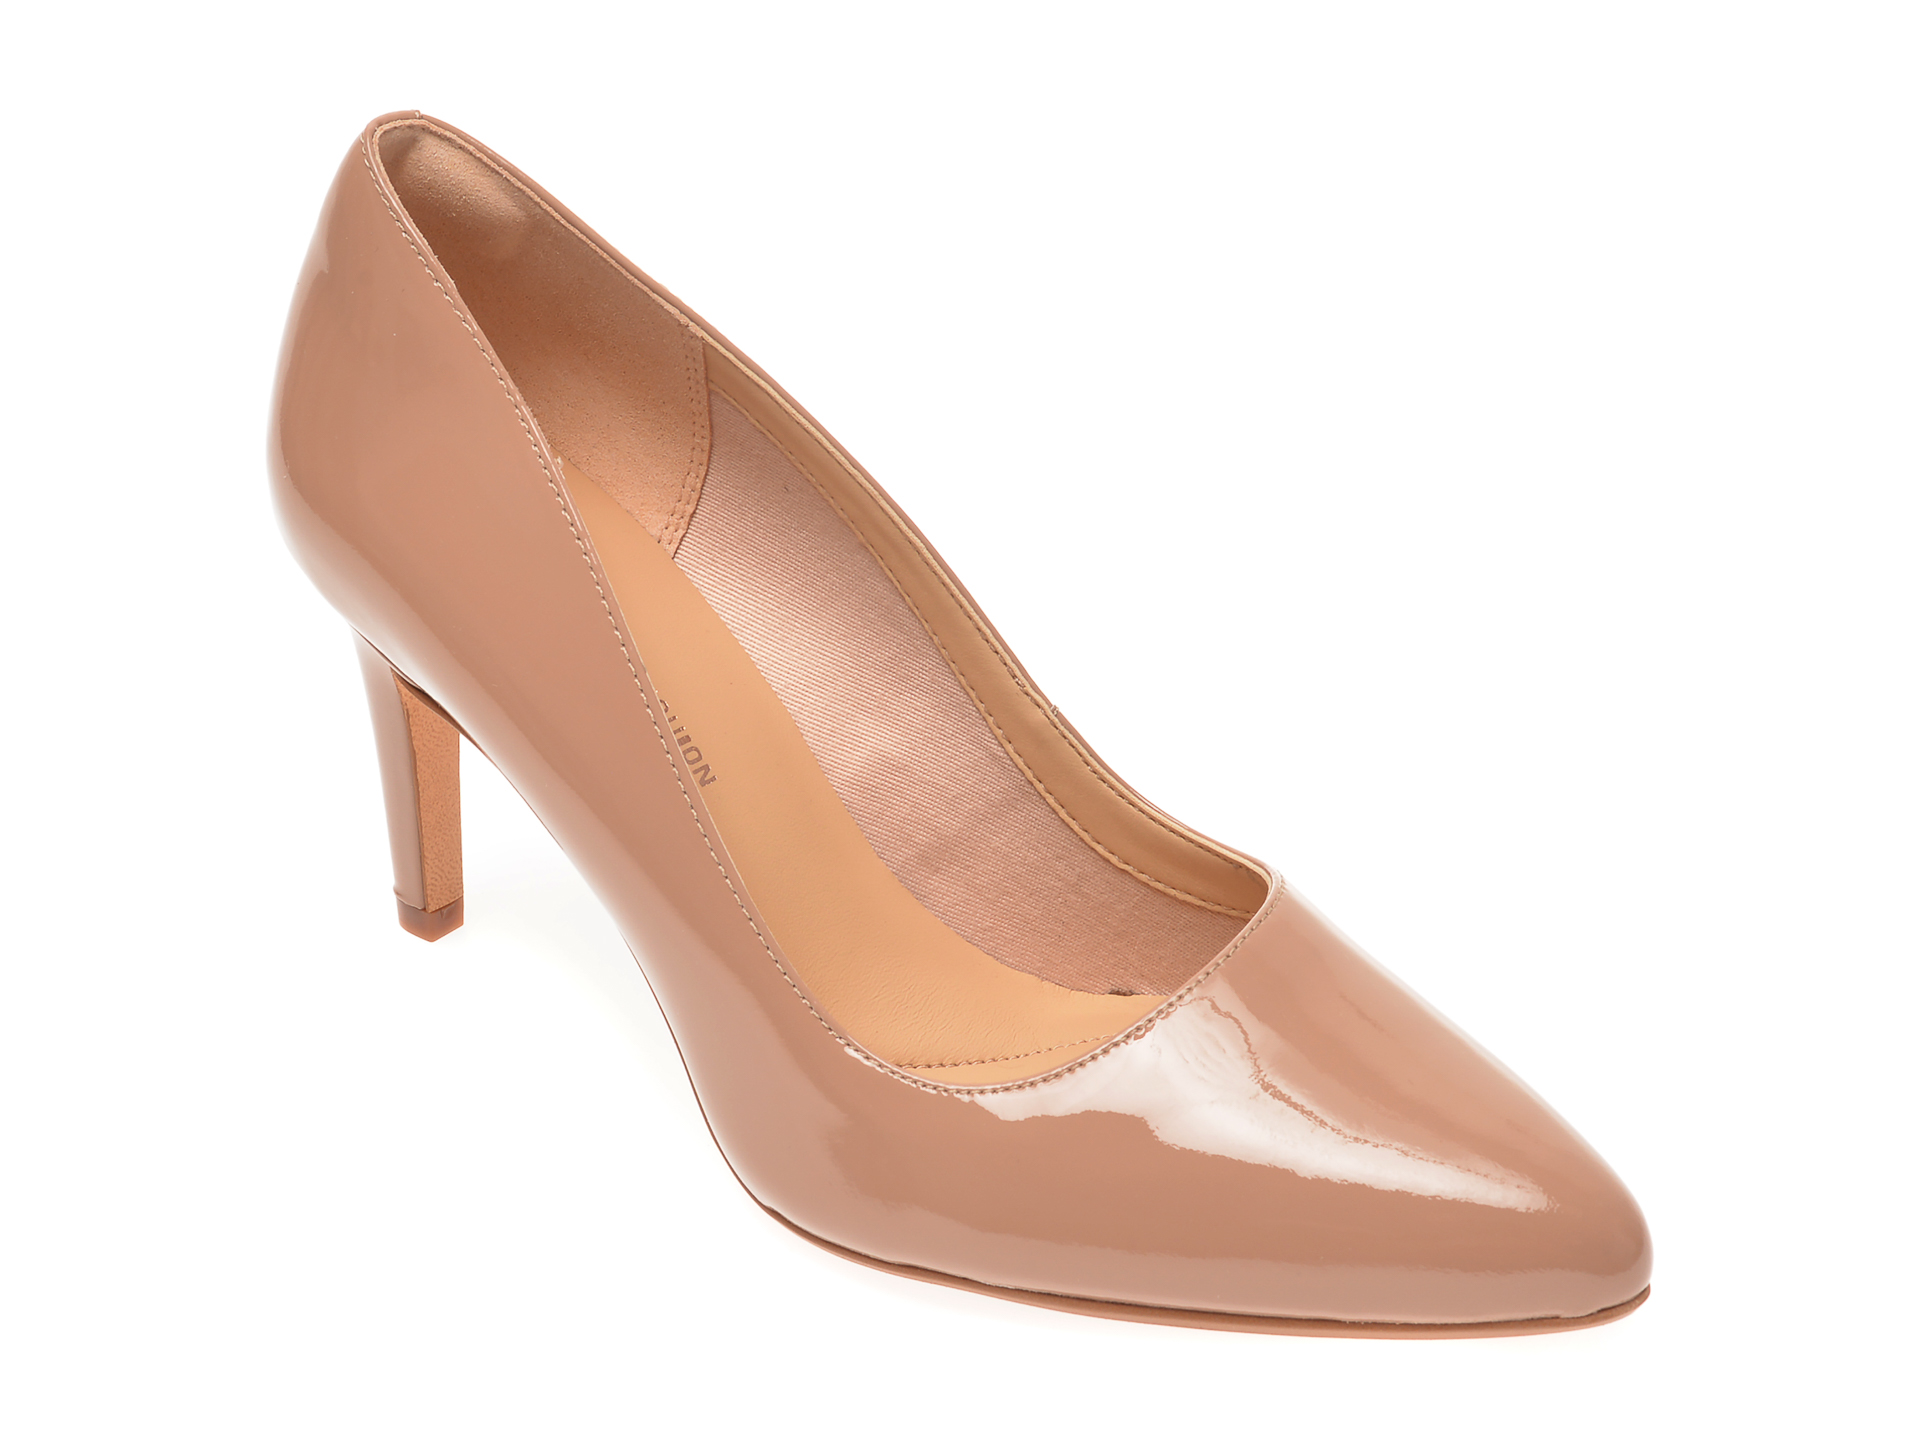 Pantofi CLARKS bej, Laina Rae, din piele naturala lacuita imagine